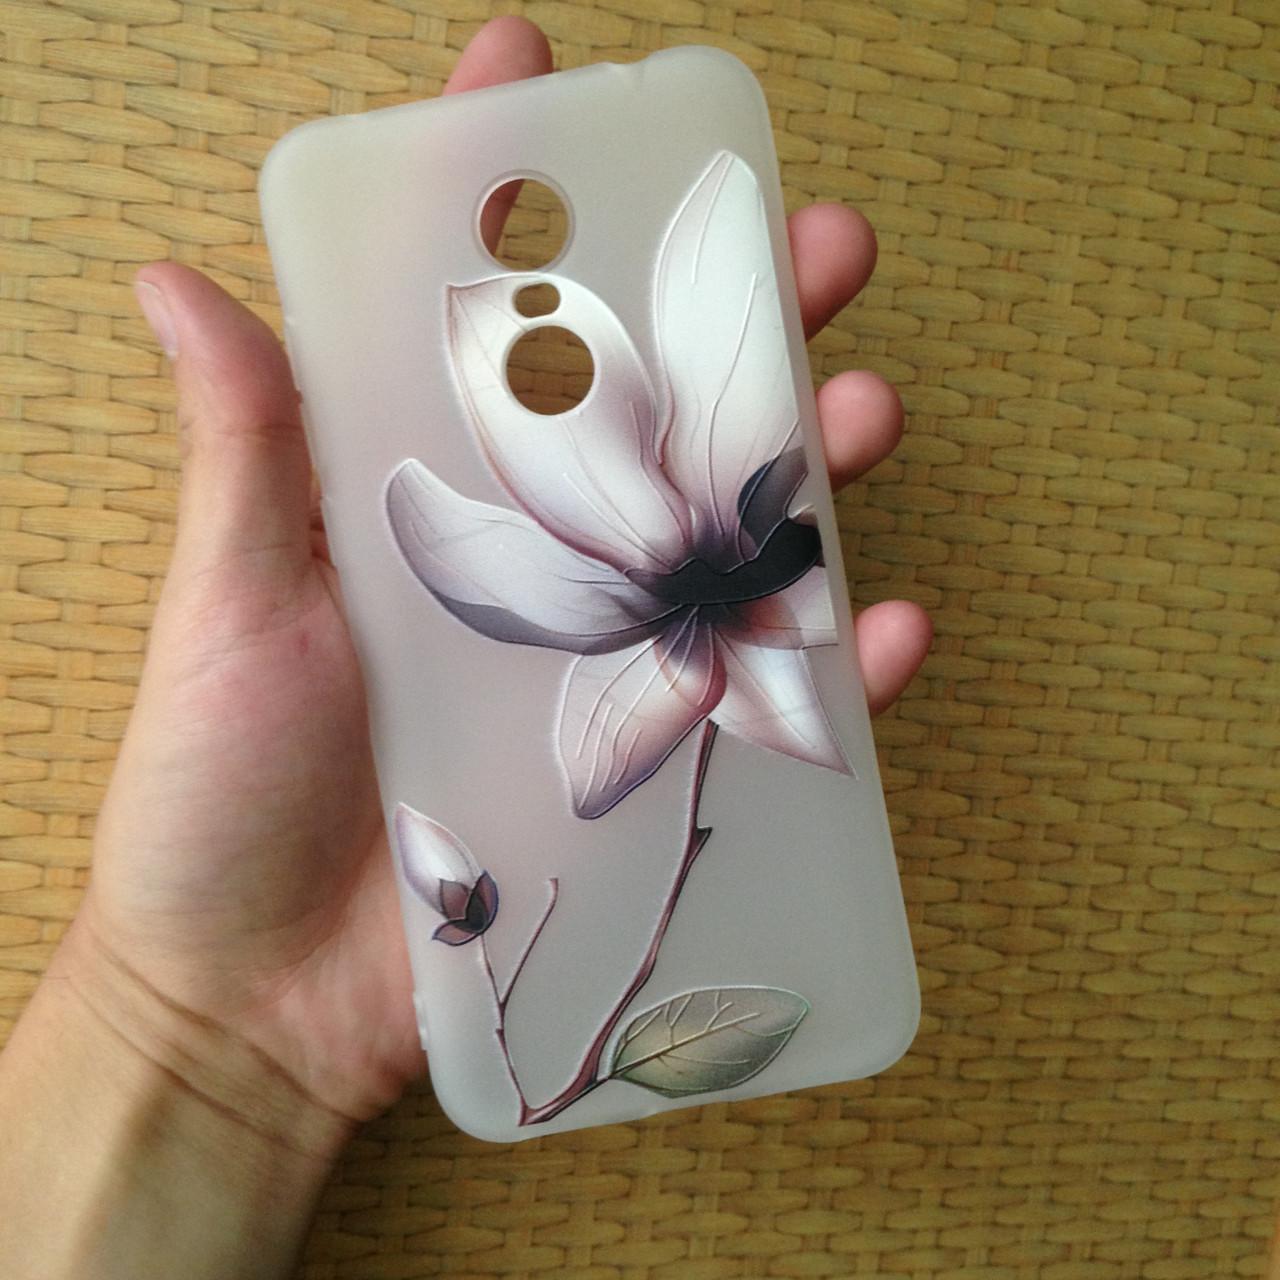 Чехол для Xiaomi Redmi 5 Plus, бампер, накладка, чохол, силиконовый, силіконовий